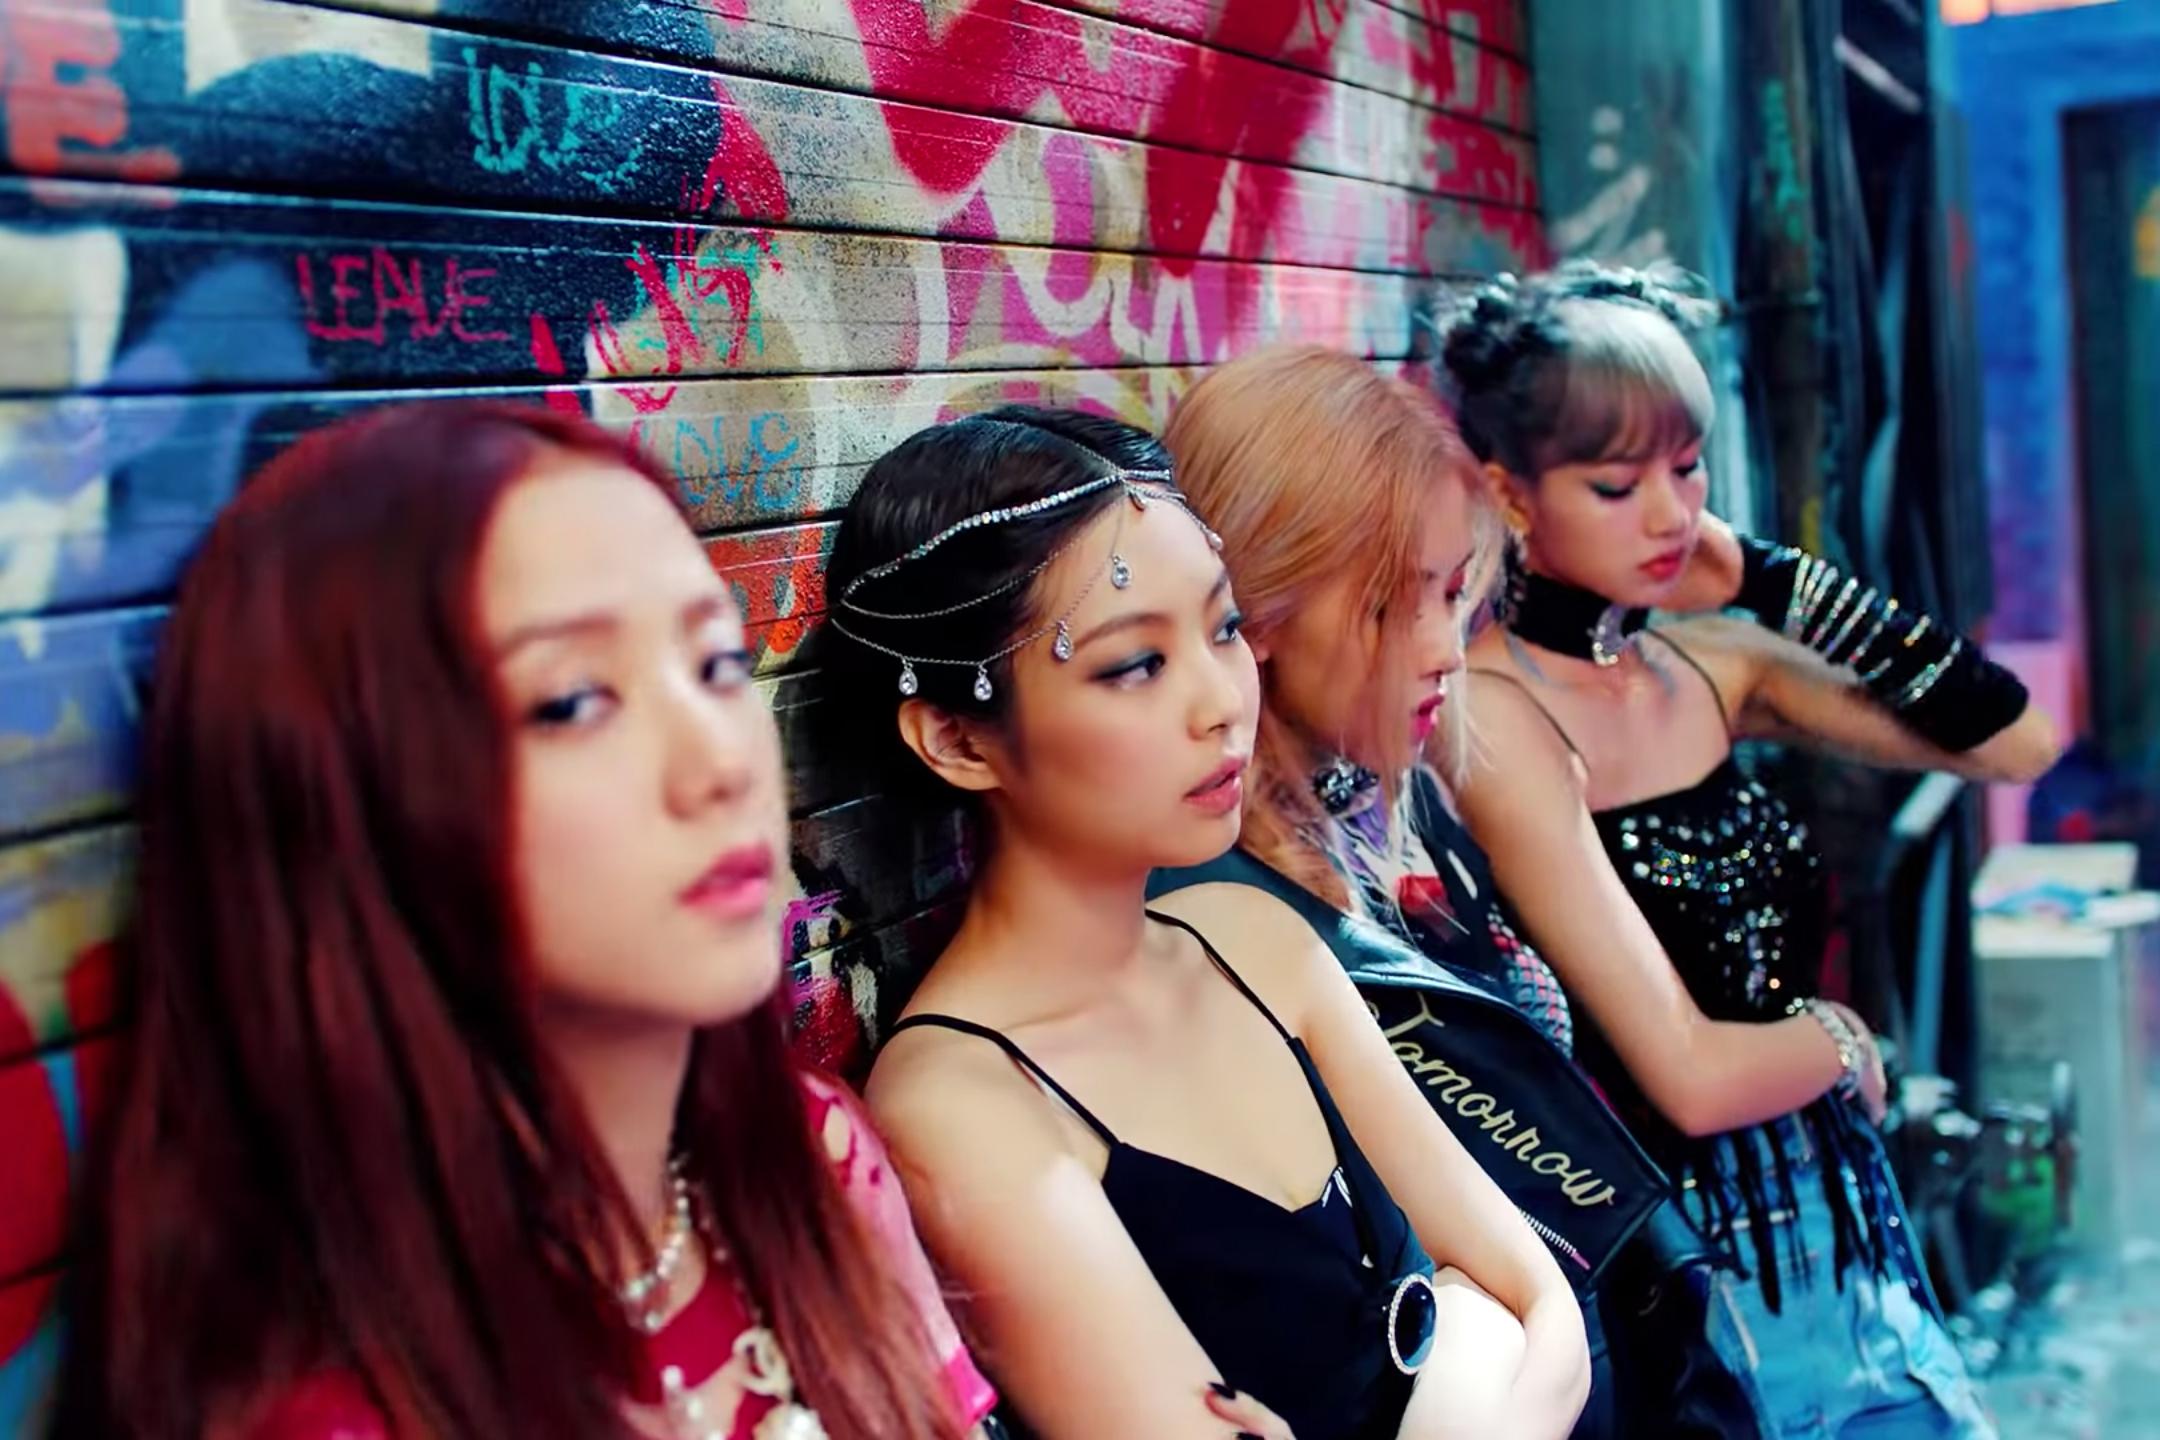 K-Pop Stars Blackpink Release 'Kill This Love' Video